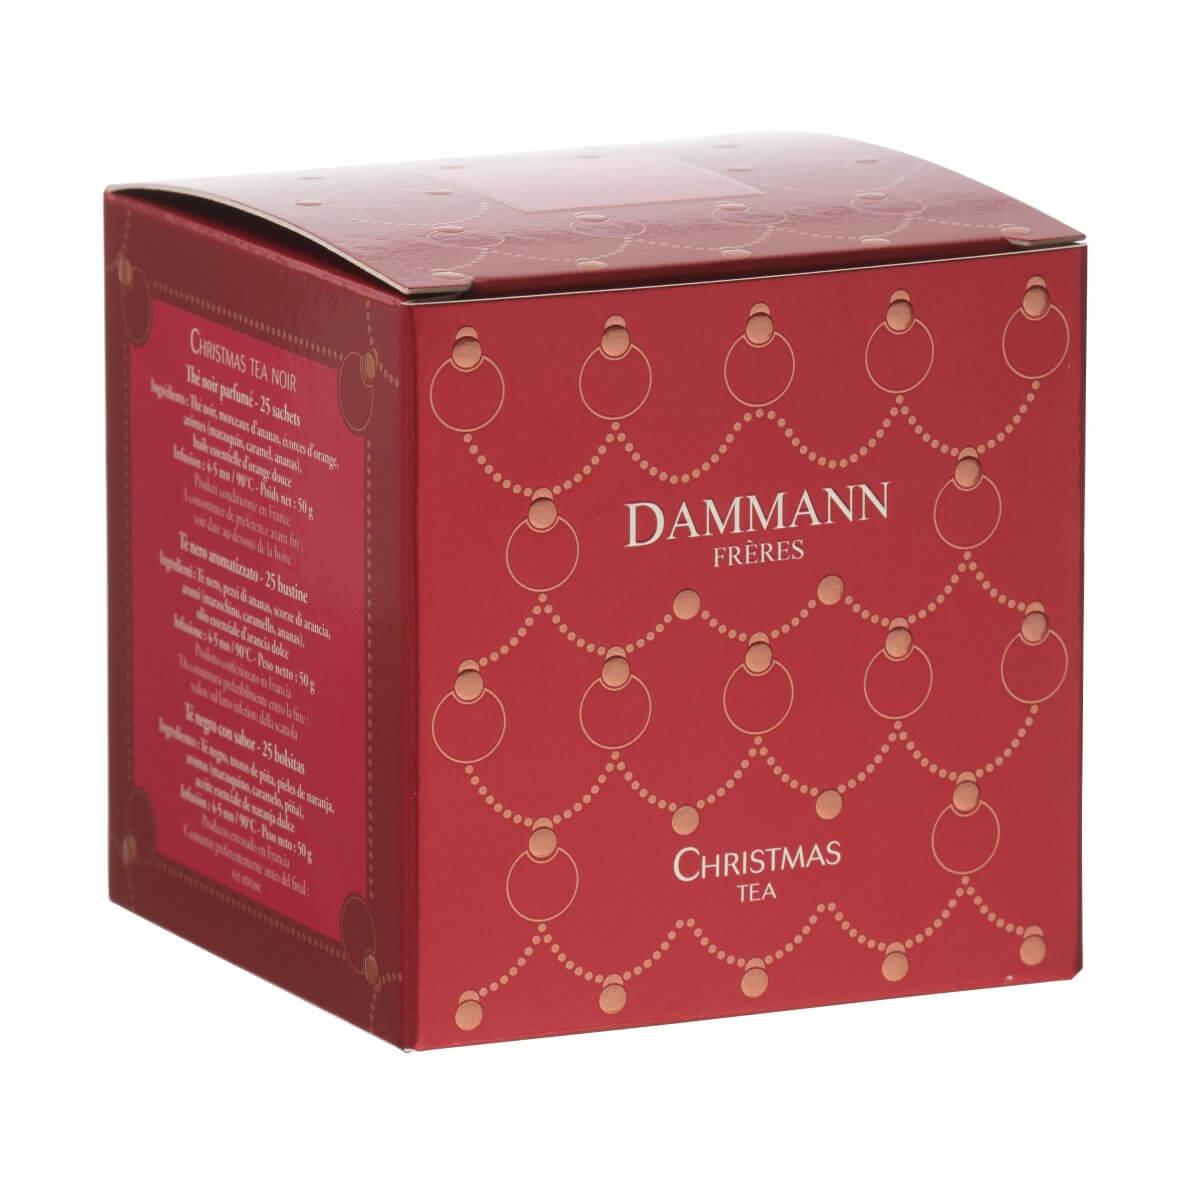 Thé Christmas Tea Dammann - boite 25 sachets Cristal